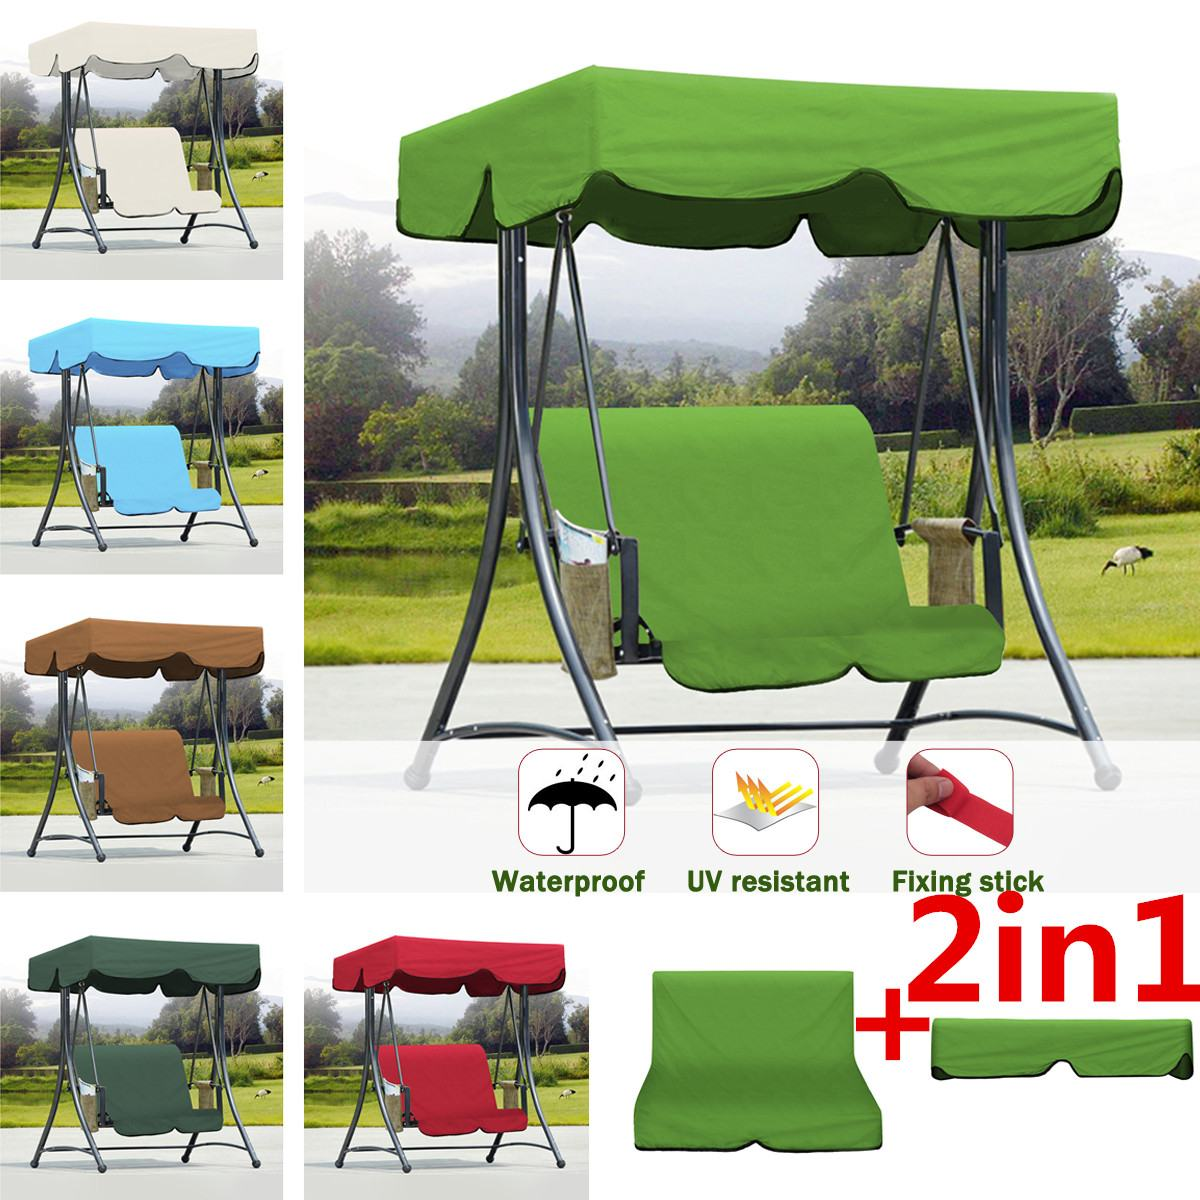 2Pcs กันน้ำ UV Swing Hammock Canopy + เก้าอี้เบาะฤดูร้อนกลางแจ้งในร่มสวน Courtyard เต็นท์ Swing TOP